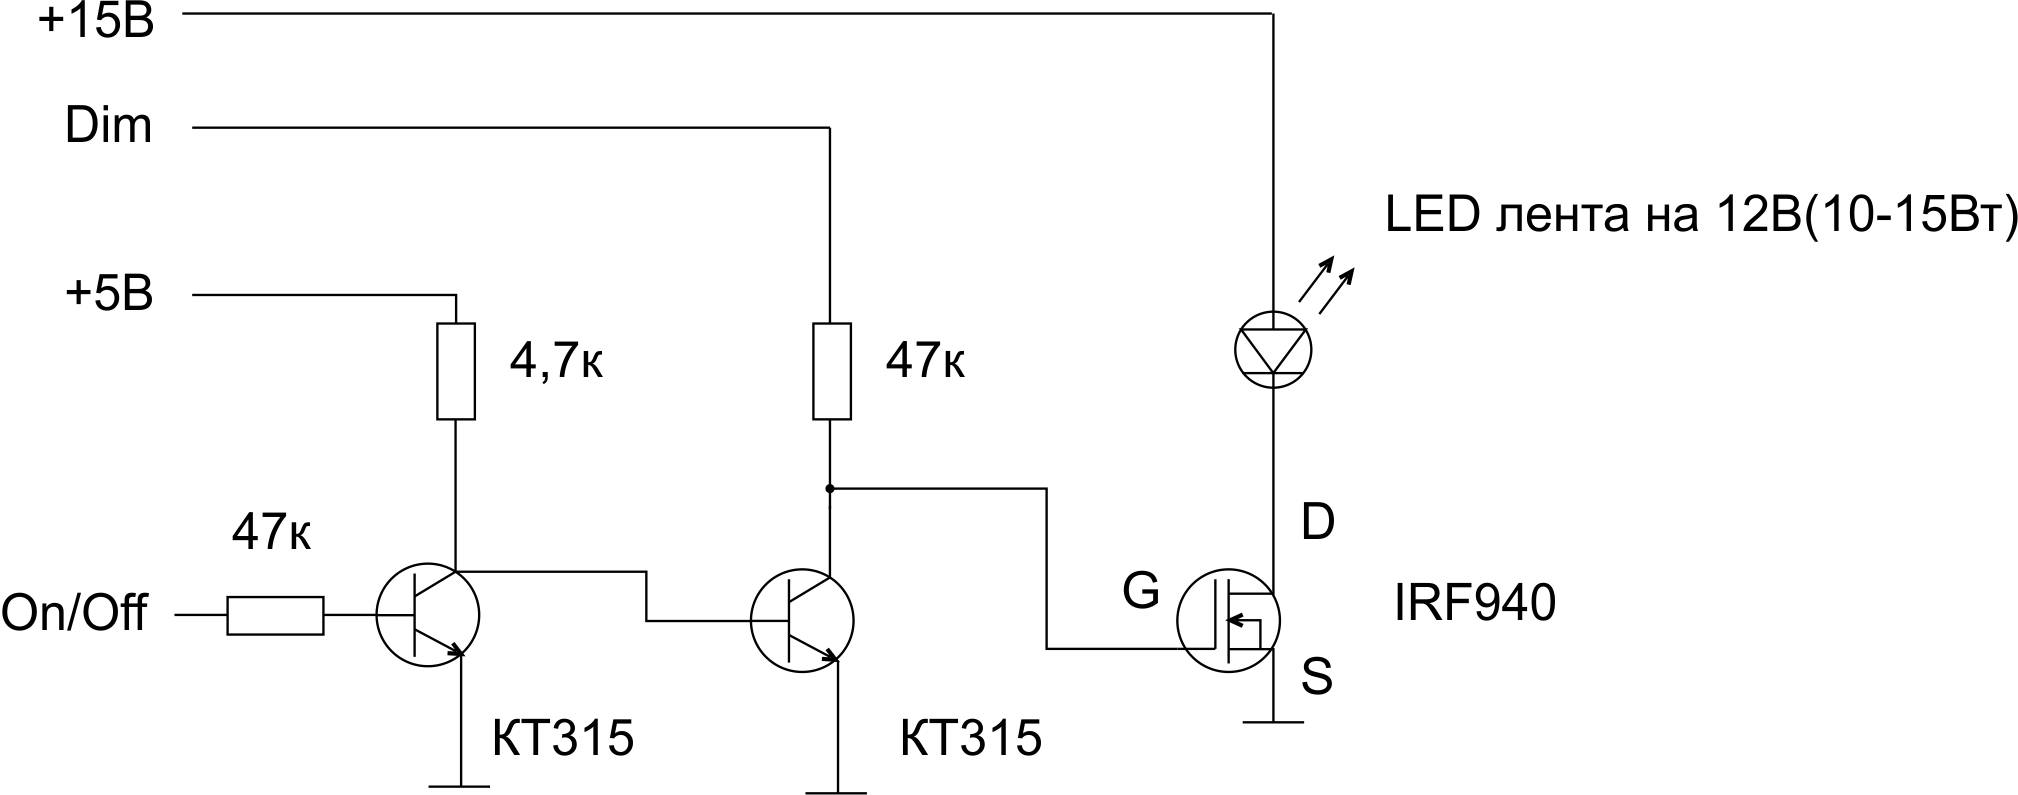 схема мультиметра ut-2005